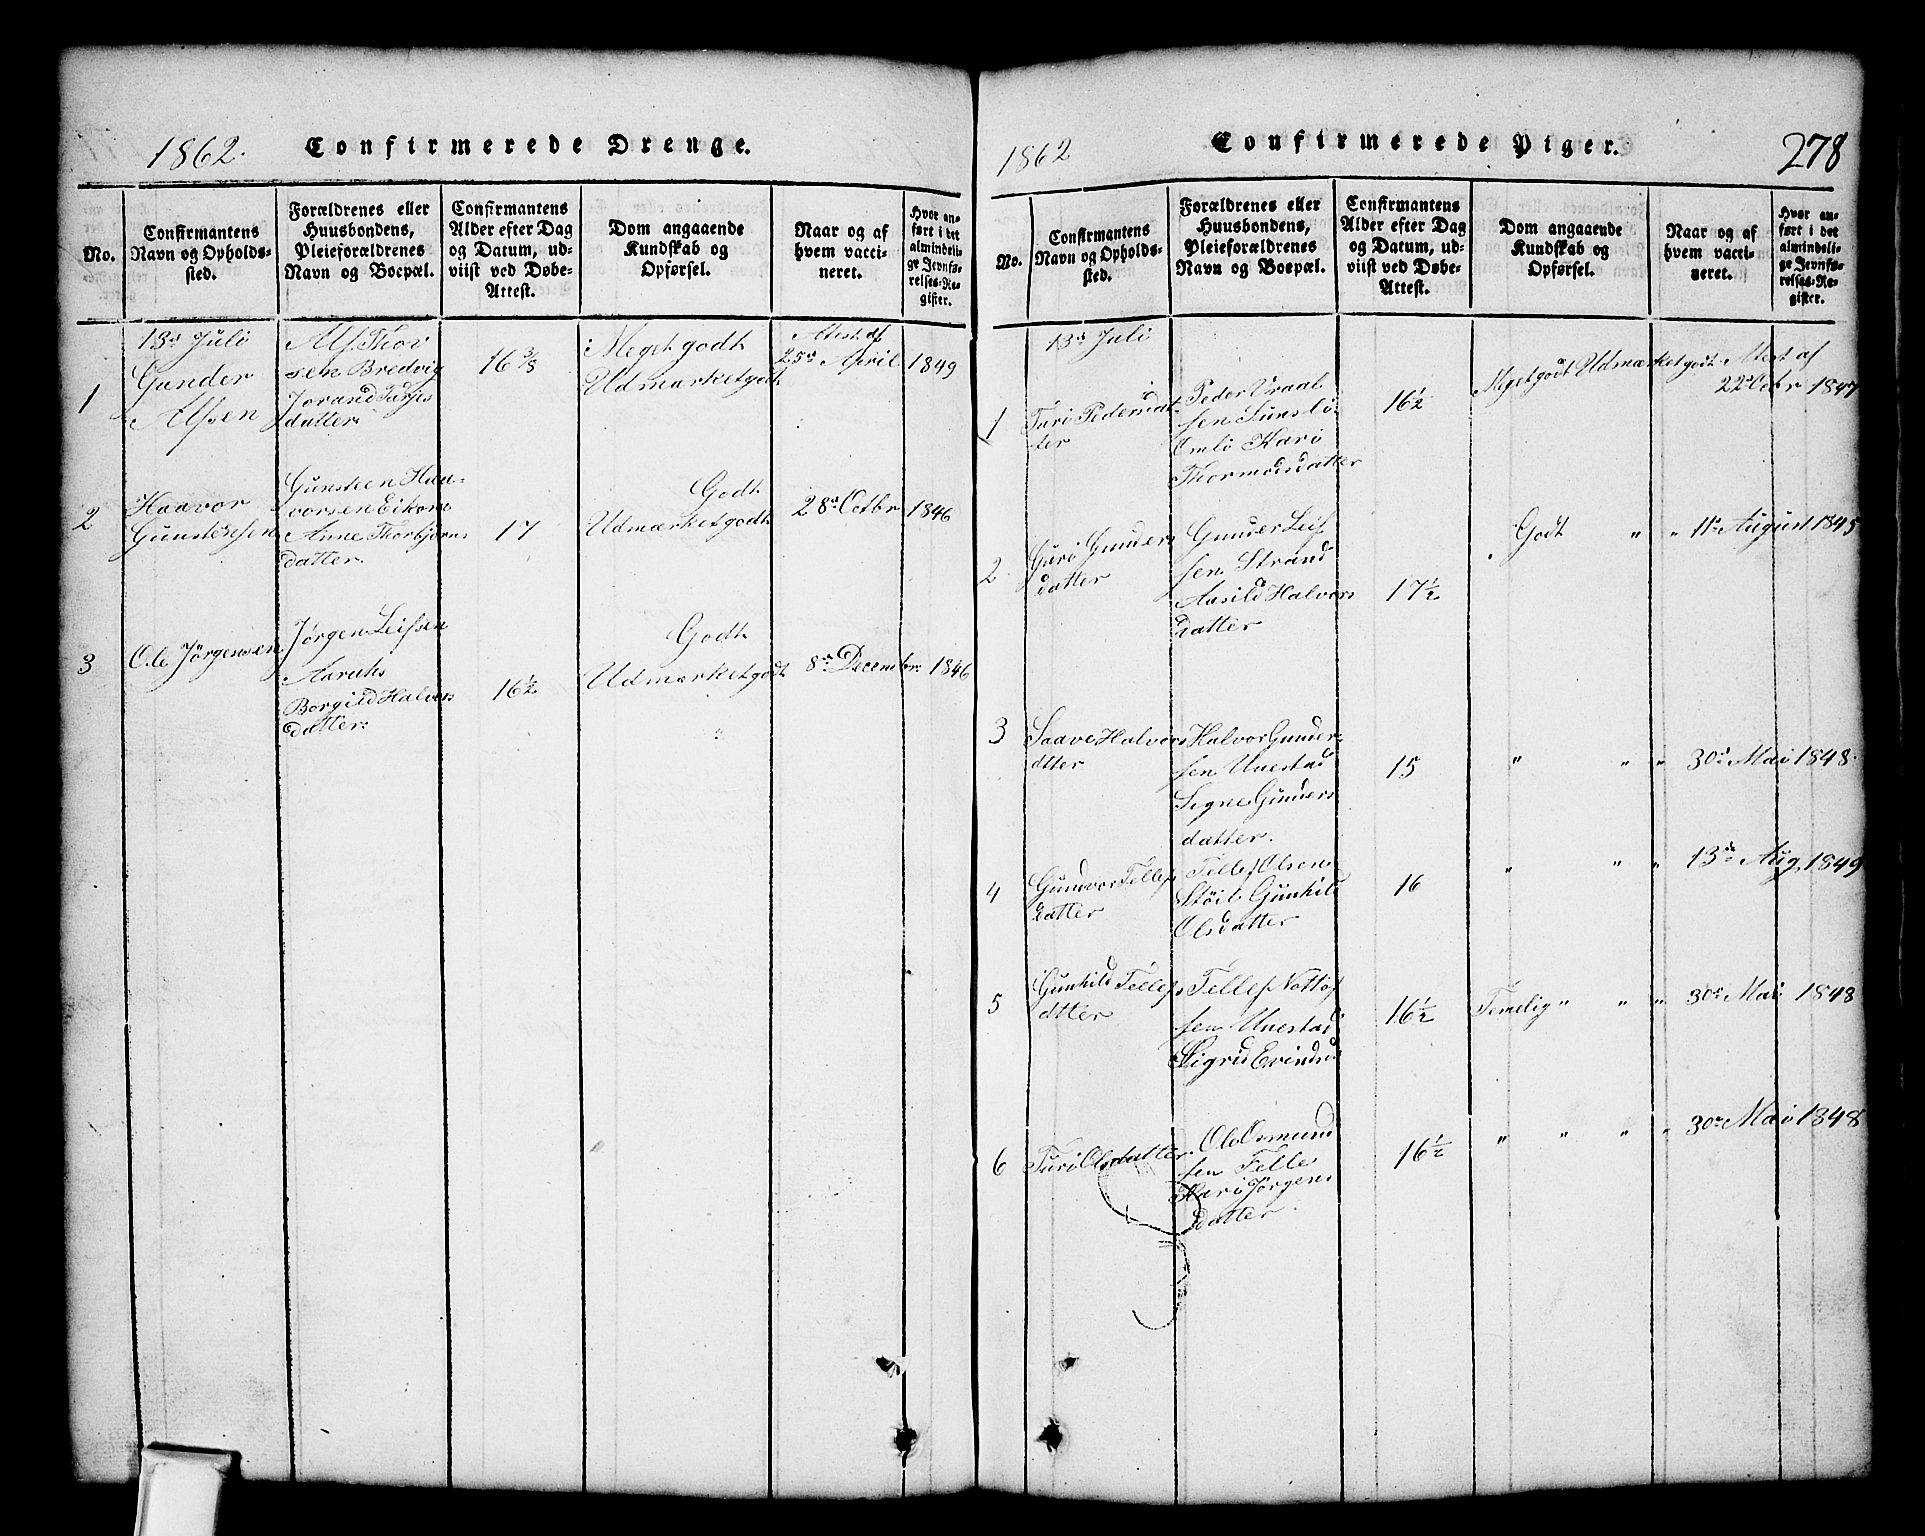 SAKO, Nissedal kirkebøker, G/Gb/L0001: Klokkerbok nr. II 1, 1814-1862, s. 278